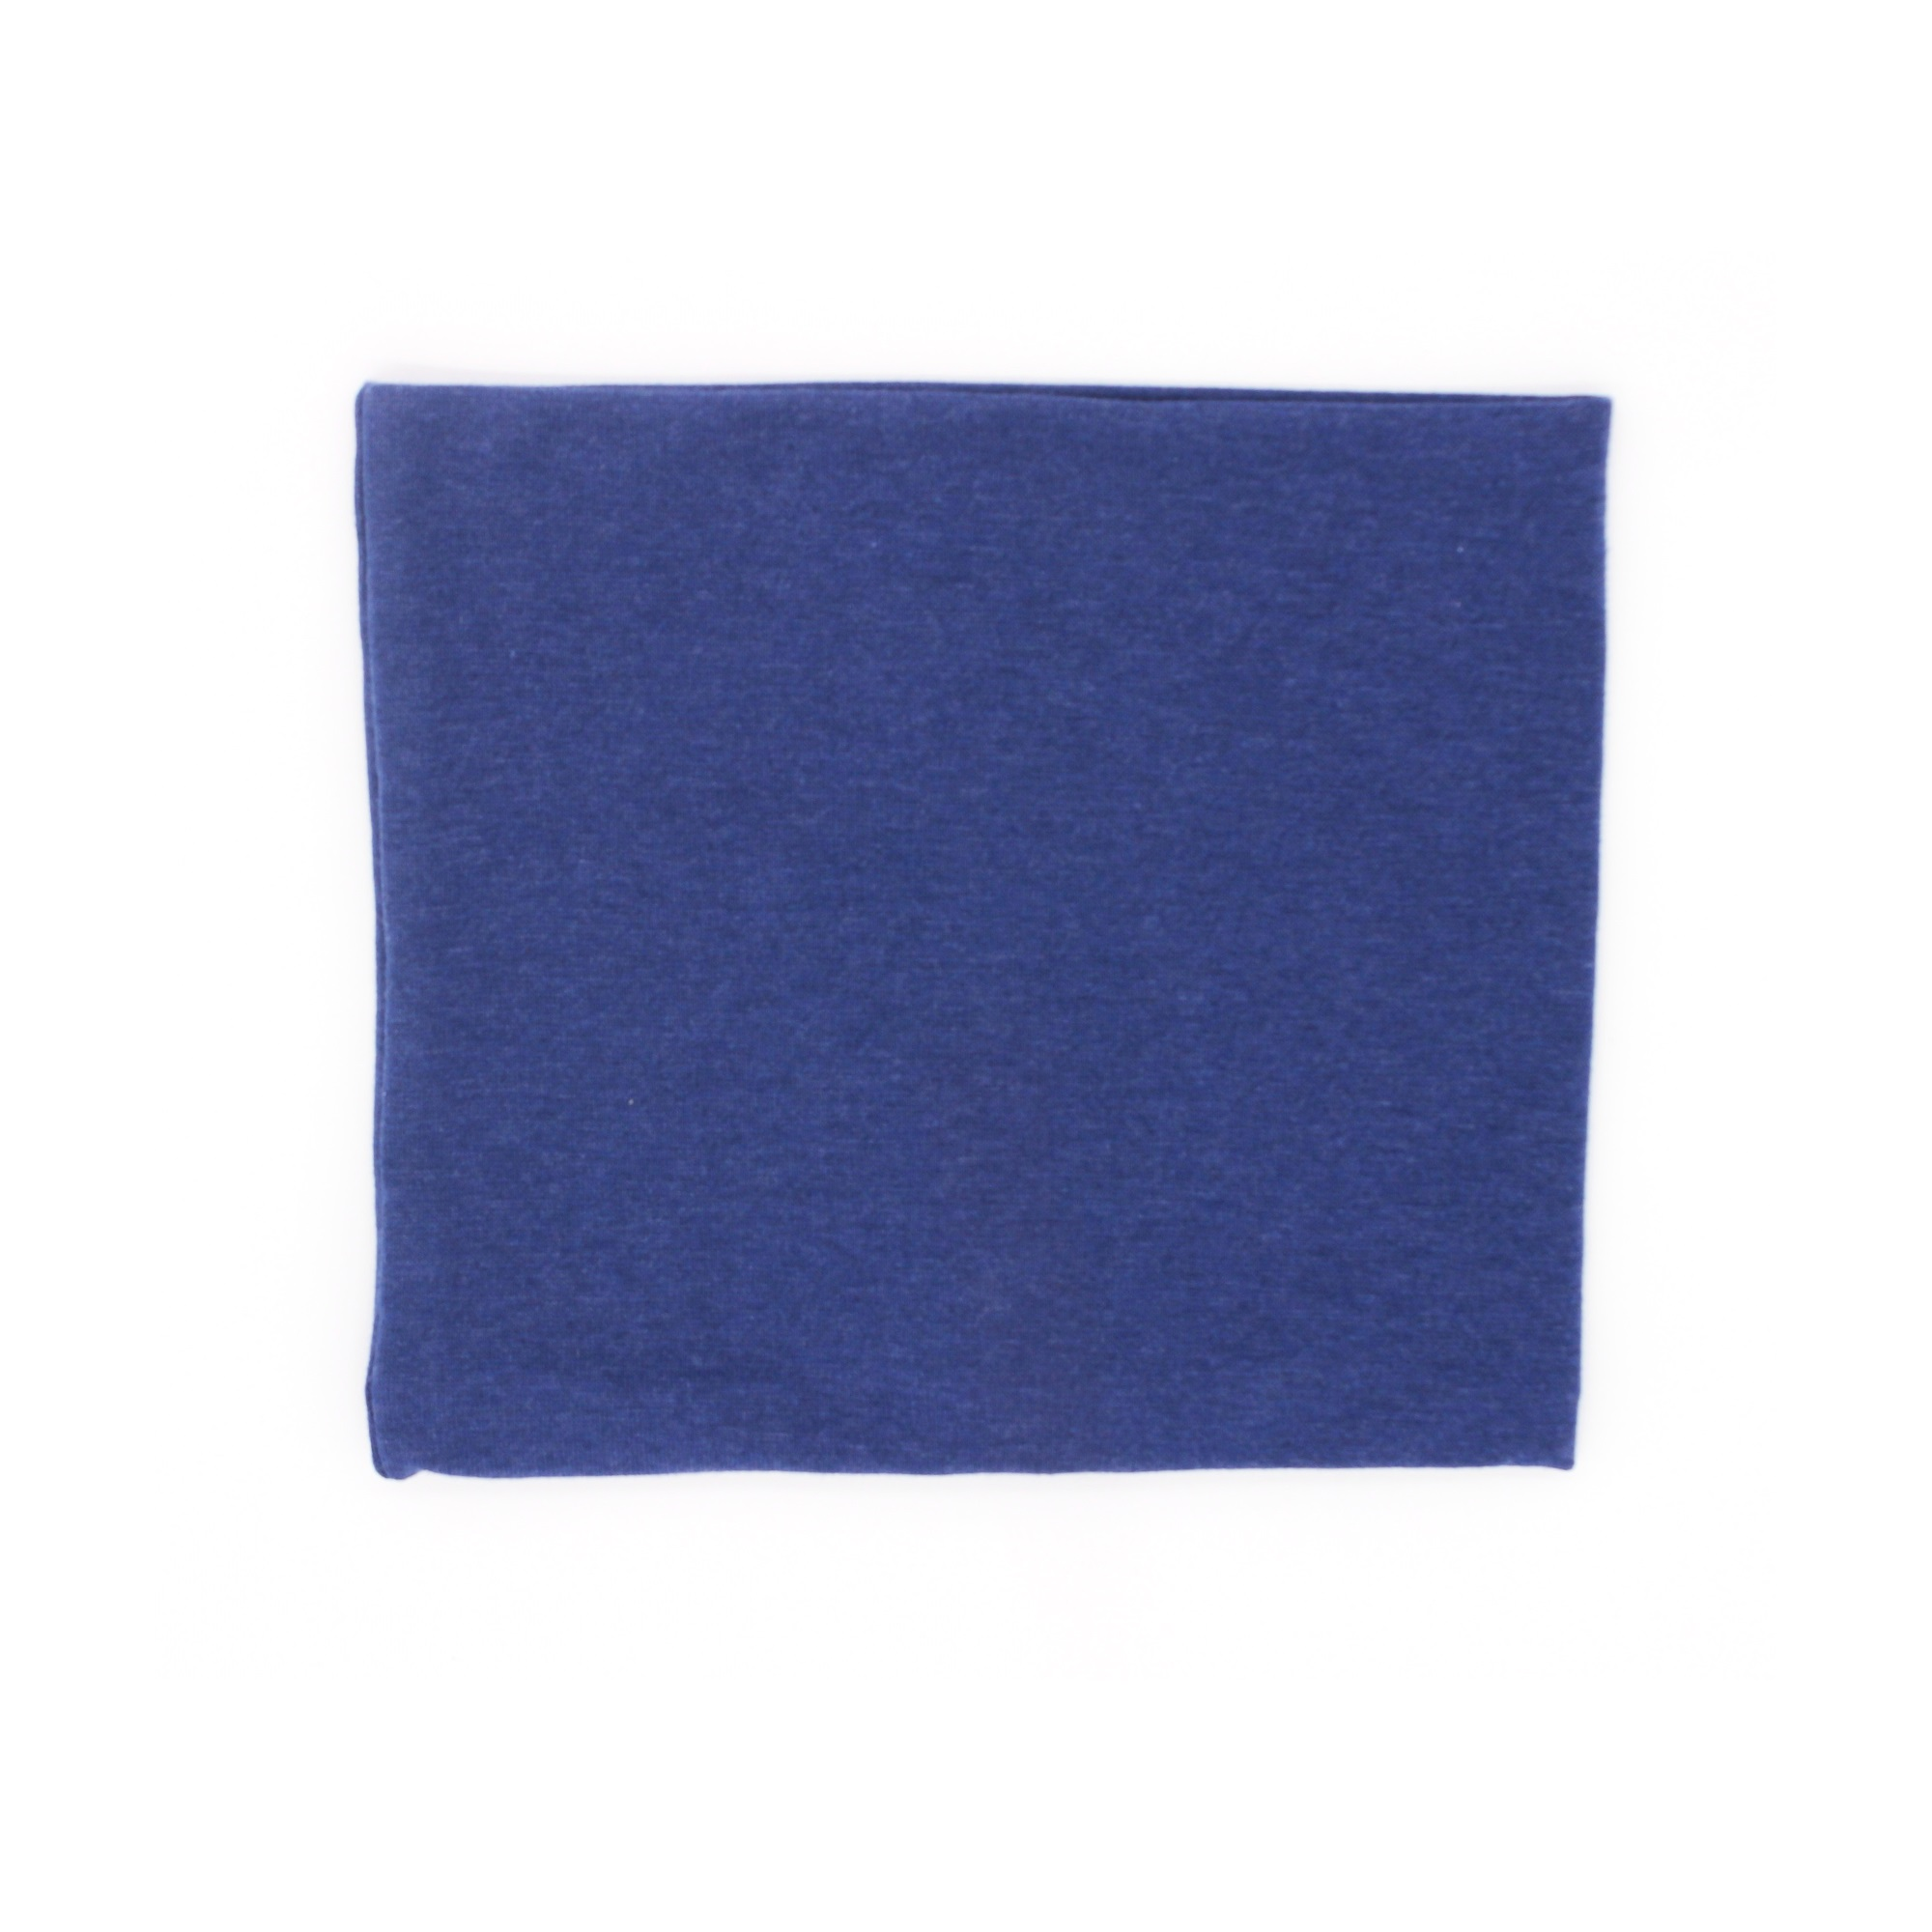 Шарф Nais, цвет: синий р.50-52 ДС.Снуд (джинс т. меланж)